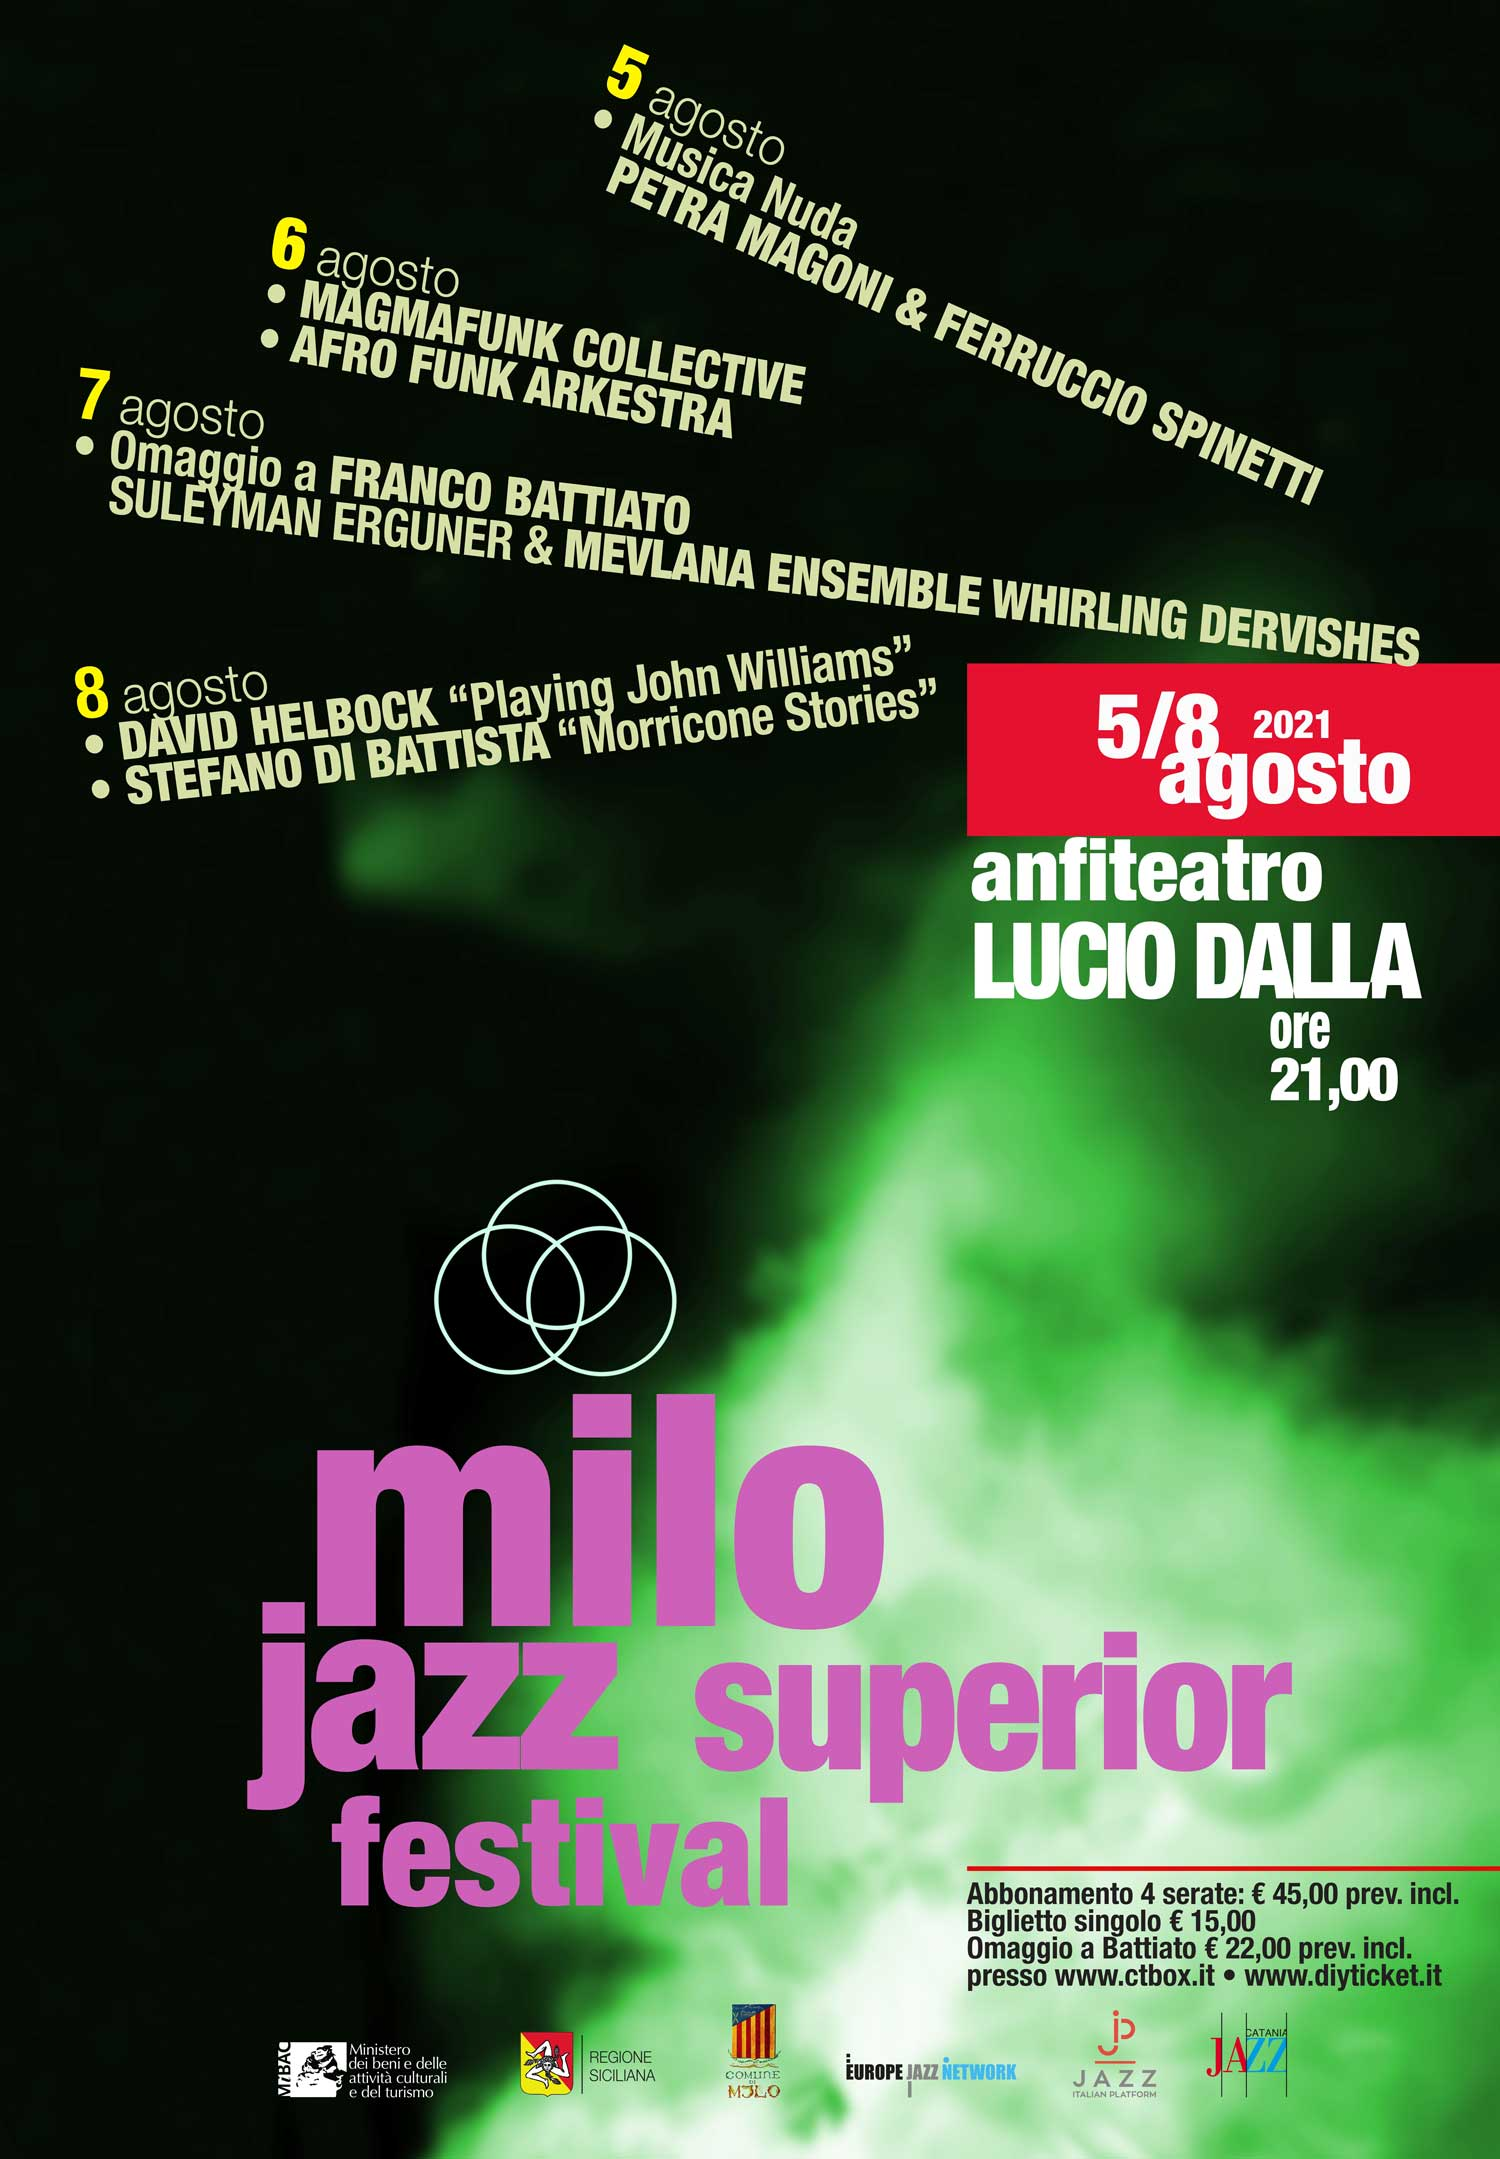 Milo Jazz Superior Festival